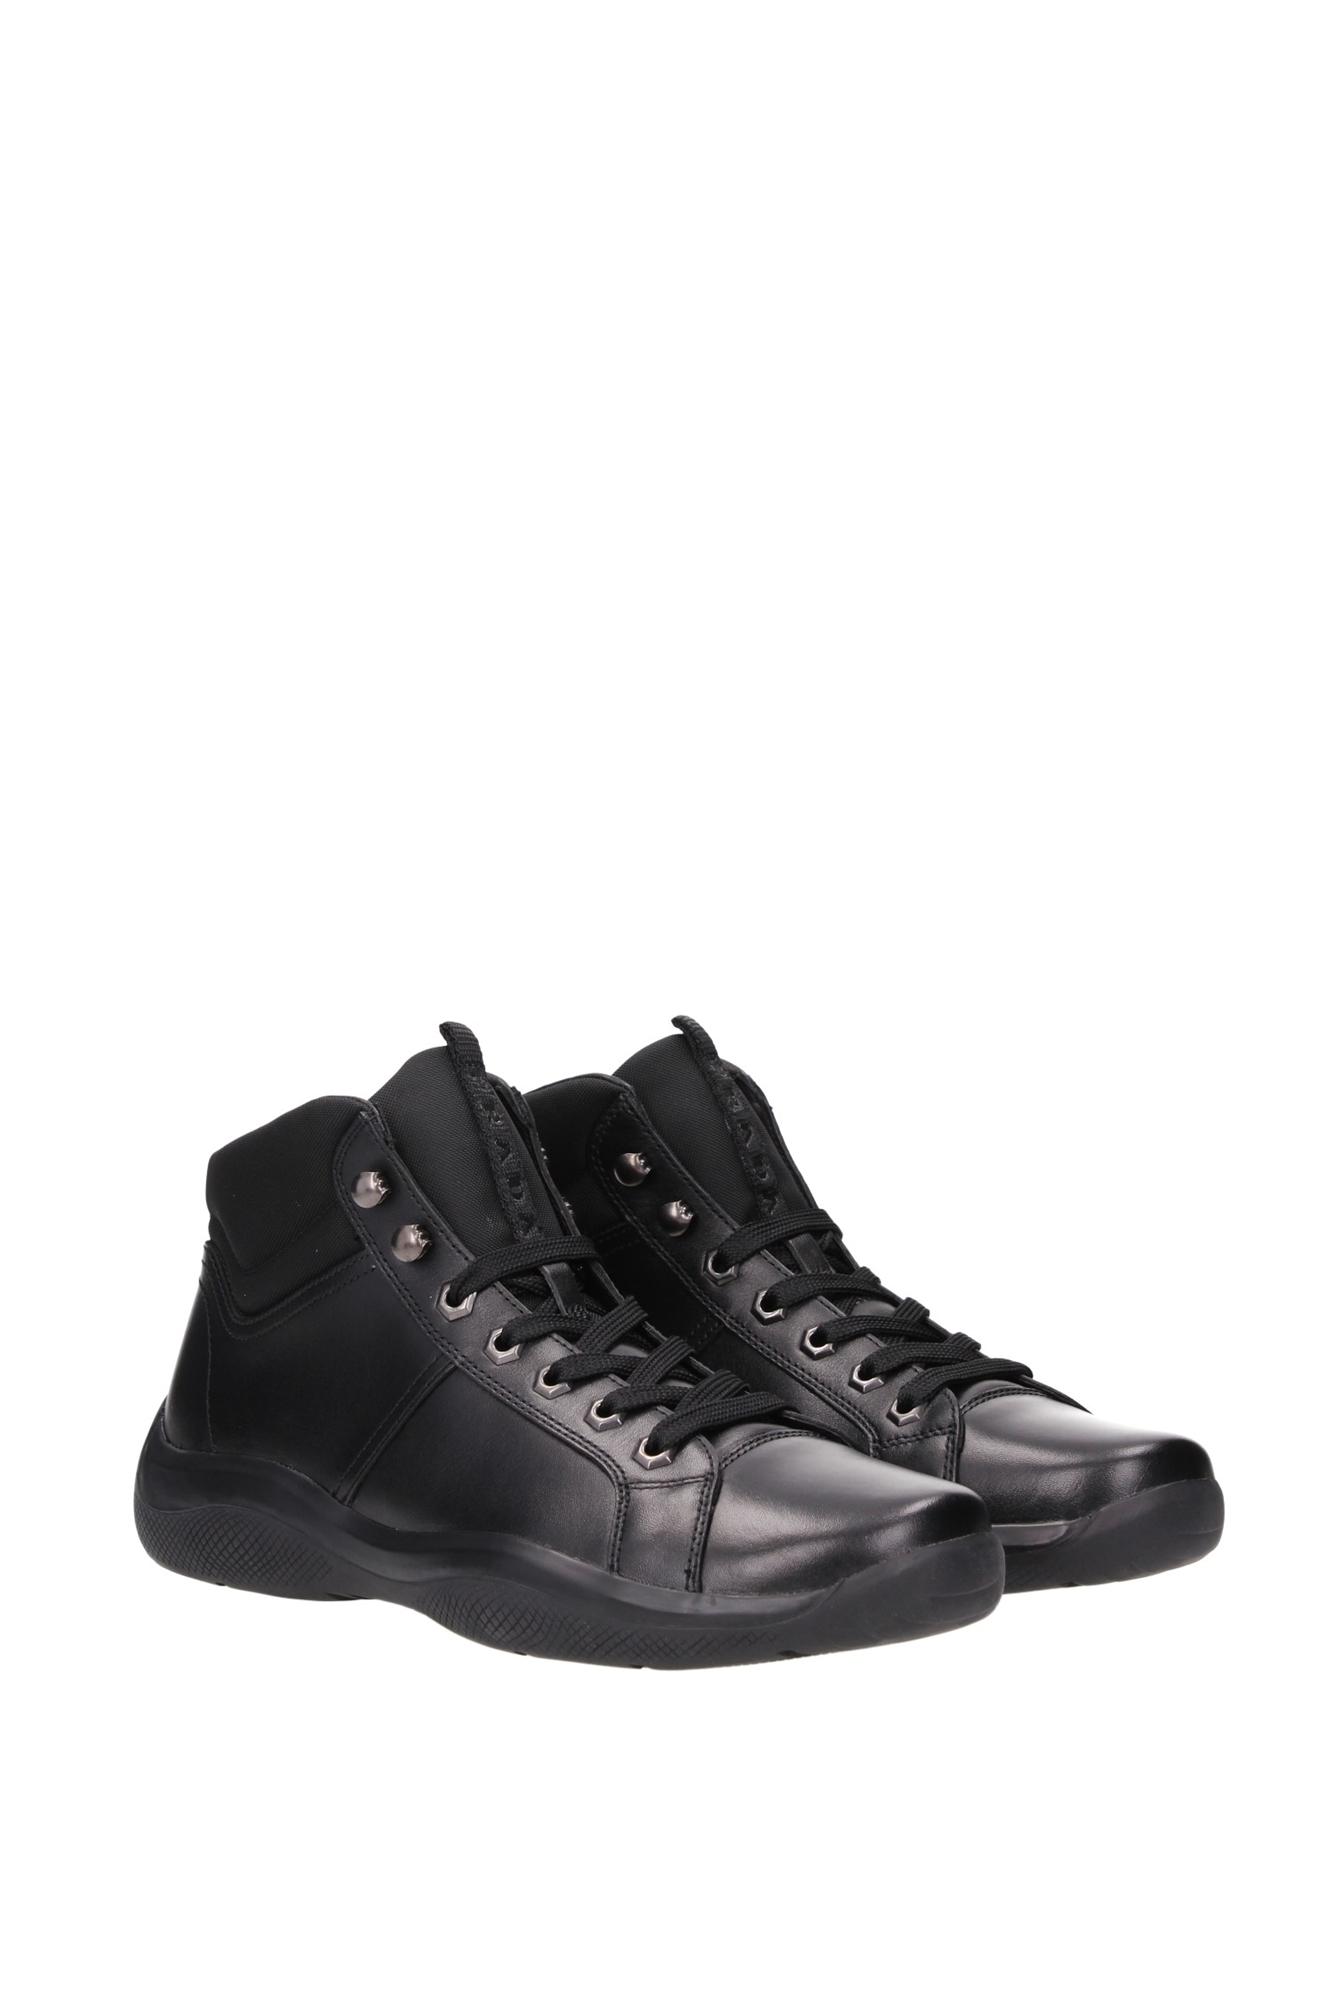 sneakers prada herren leder schwarz 4t2762nero ebay. Black Bedroom Furniture Sets. Home Design Ideas